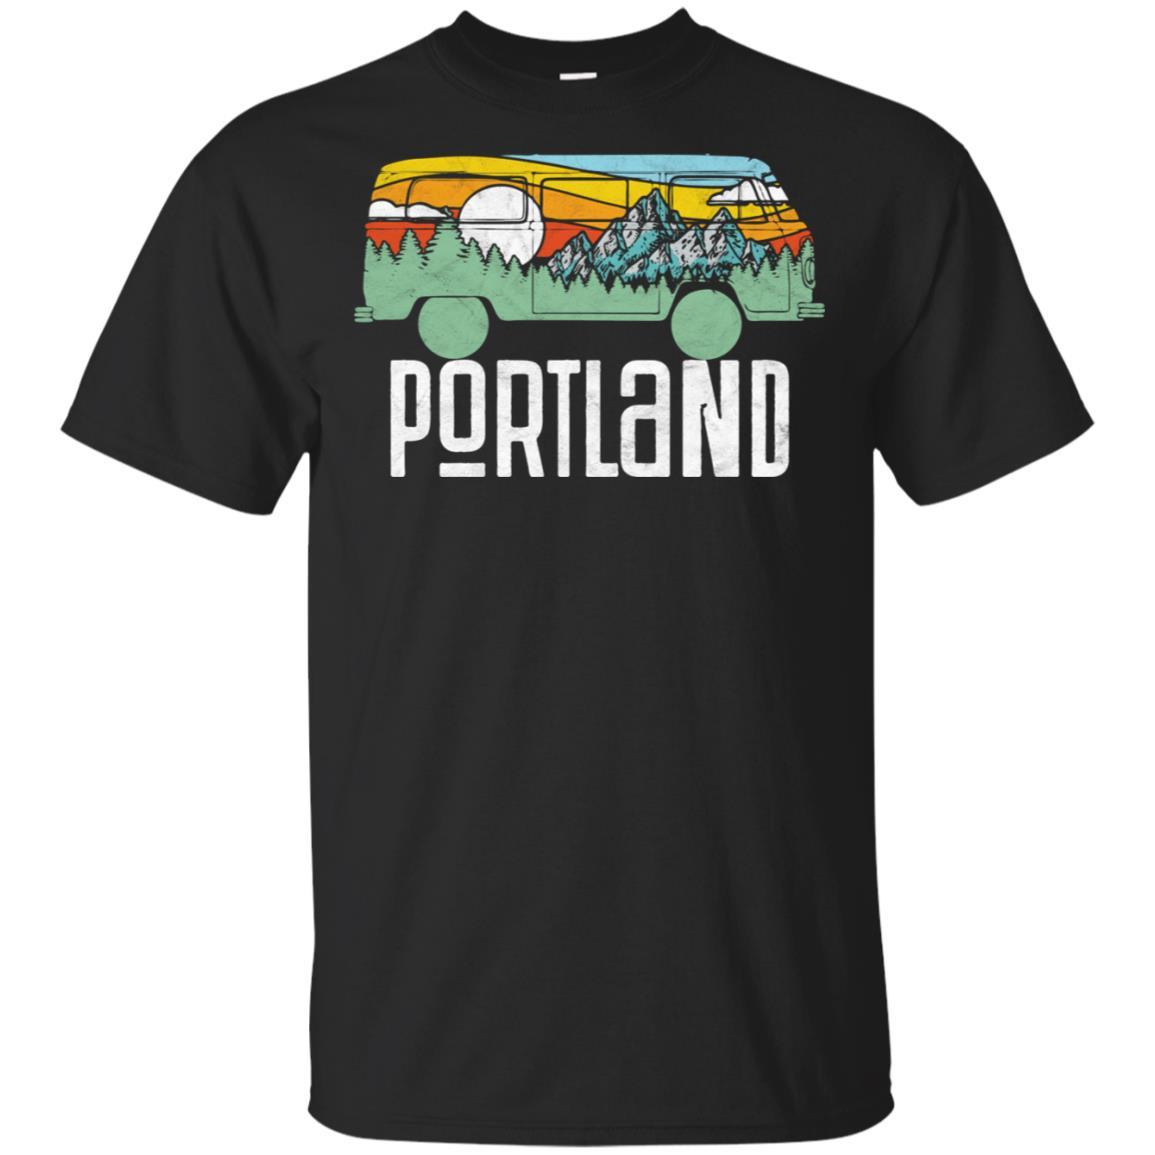 Retro Porland Oregon Outdoor Hippie Van Unisex Short Sleeve